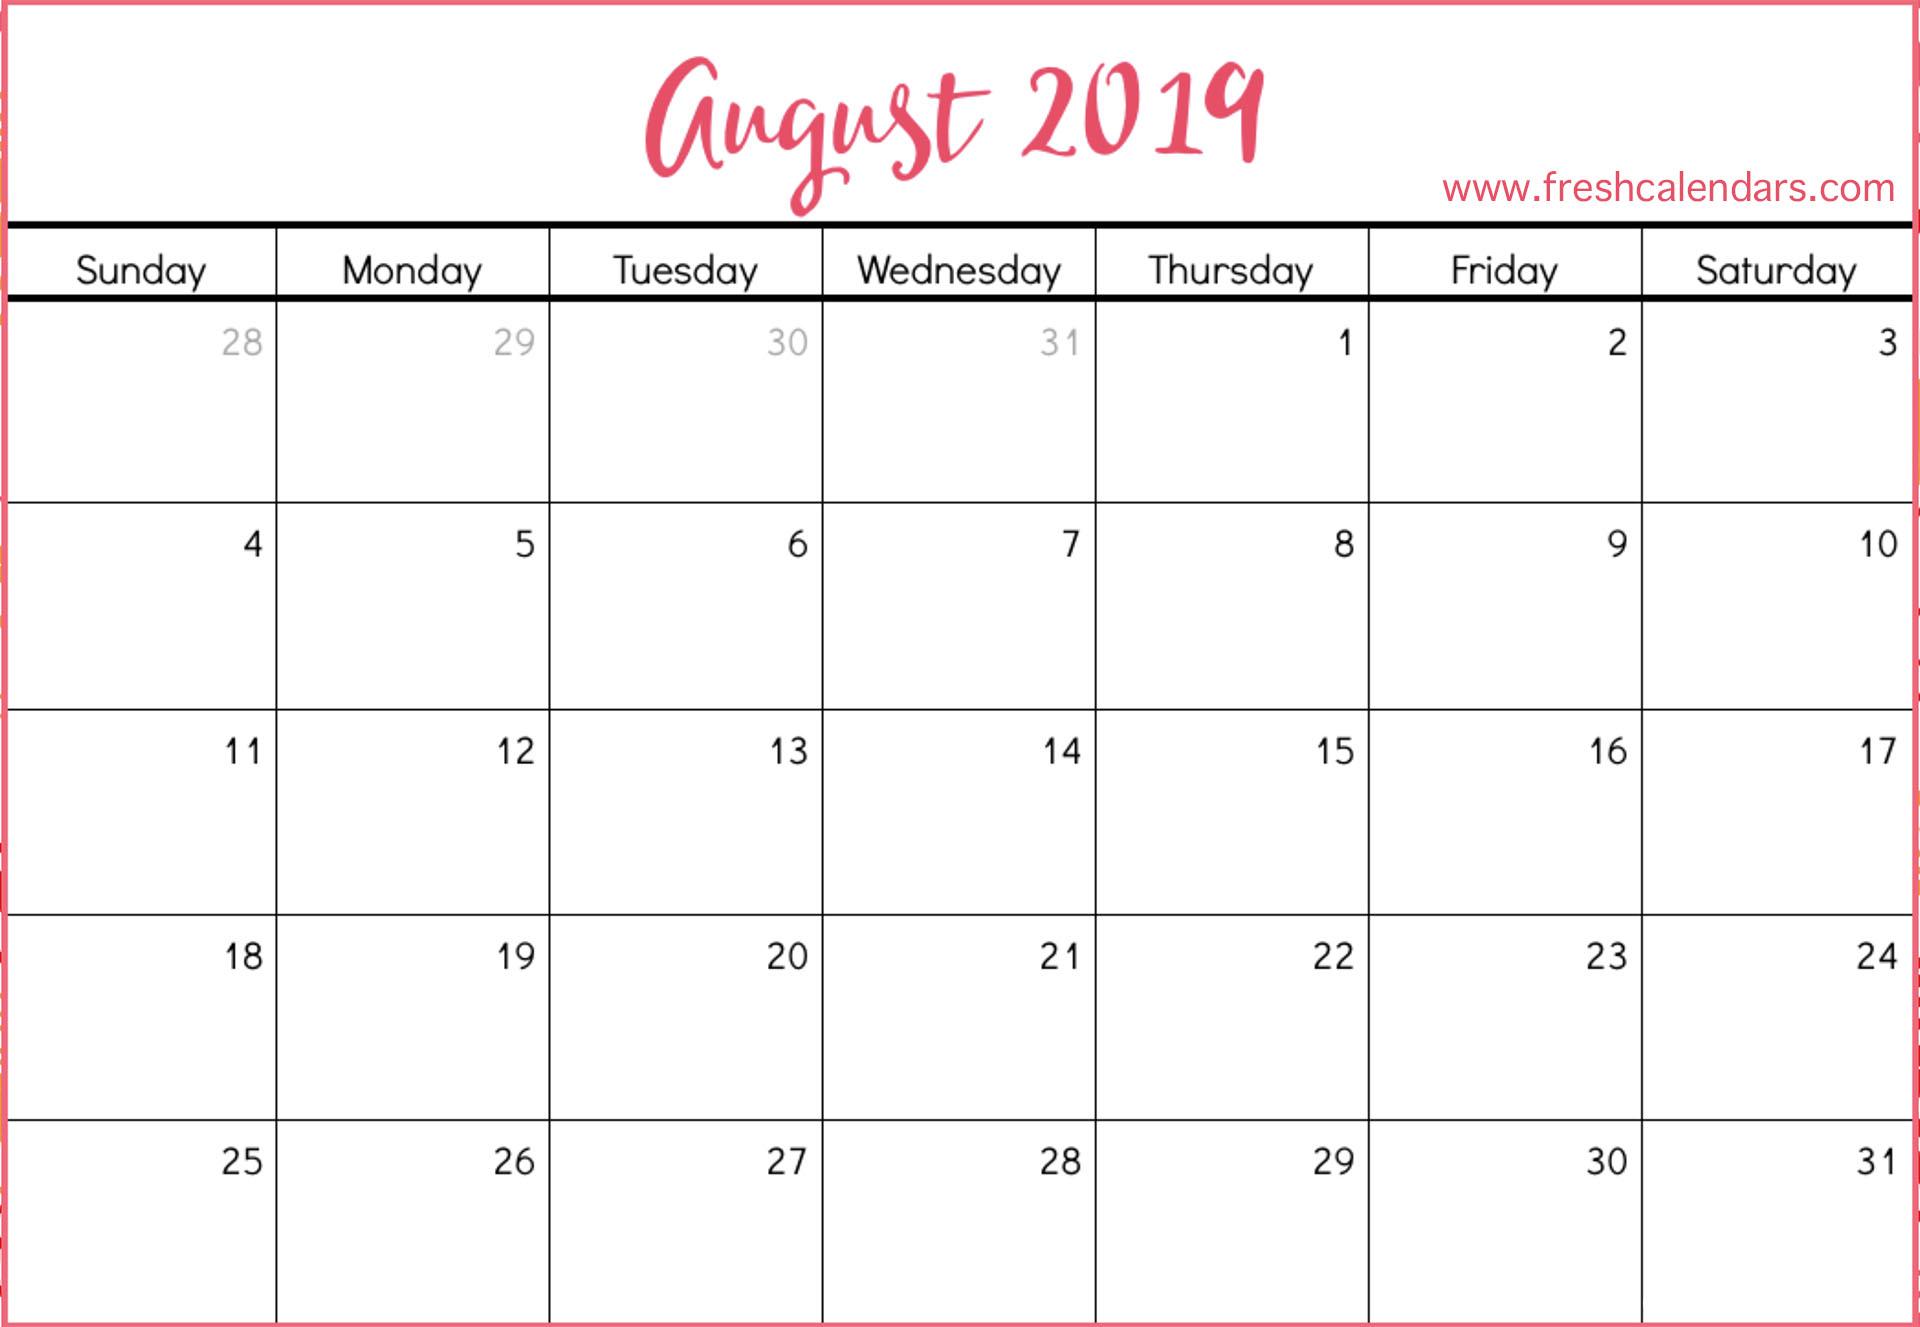 August 2019 Calendar Printable - Fresh Calendars in Fancy August Printable Calendar Template